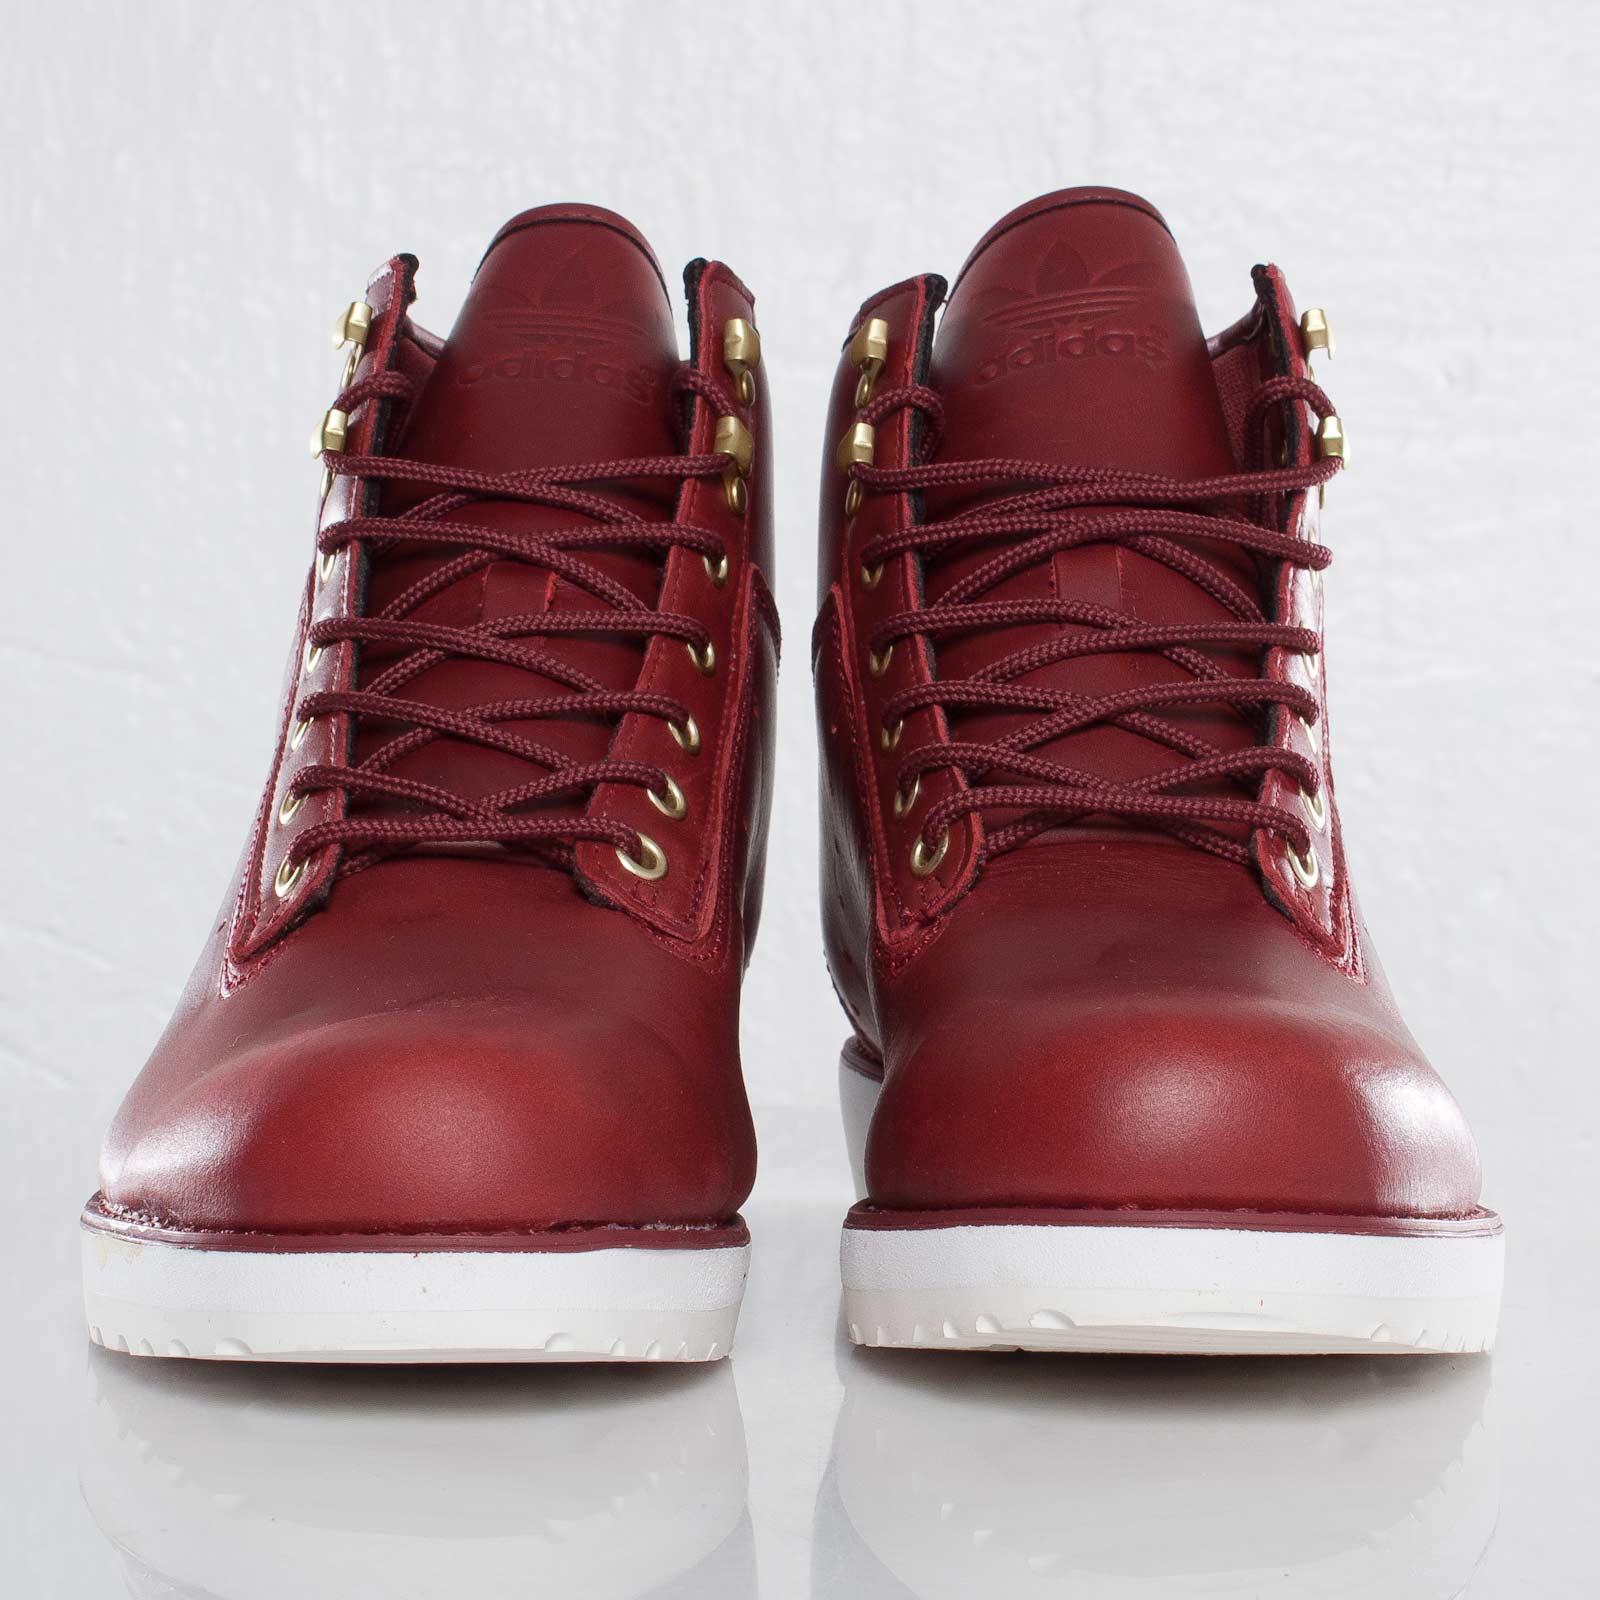 b048fb578915 adidas Adi Navvy Boot - G60547 - Sneakersnstuff